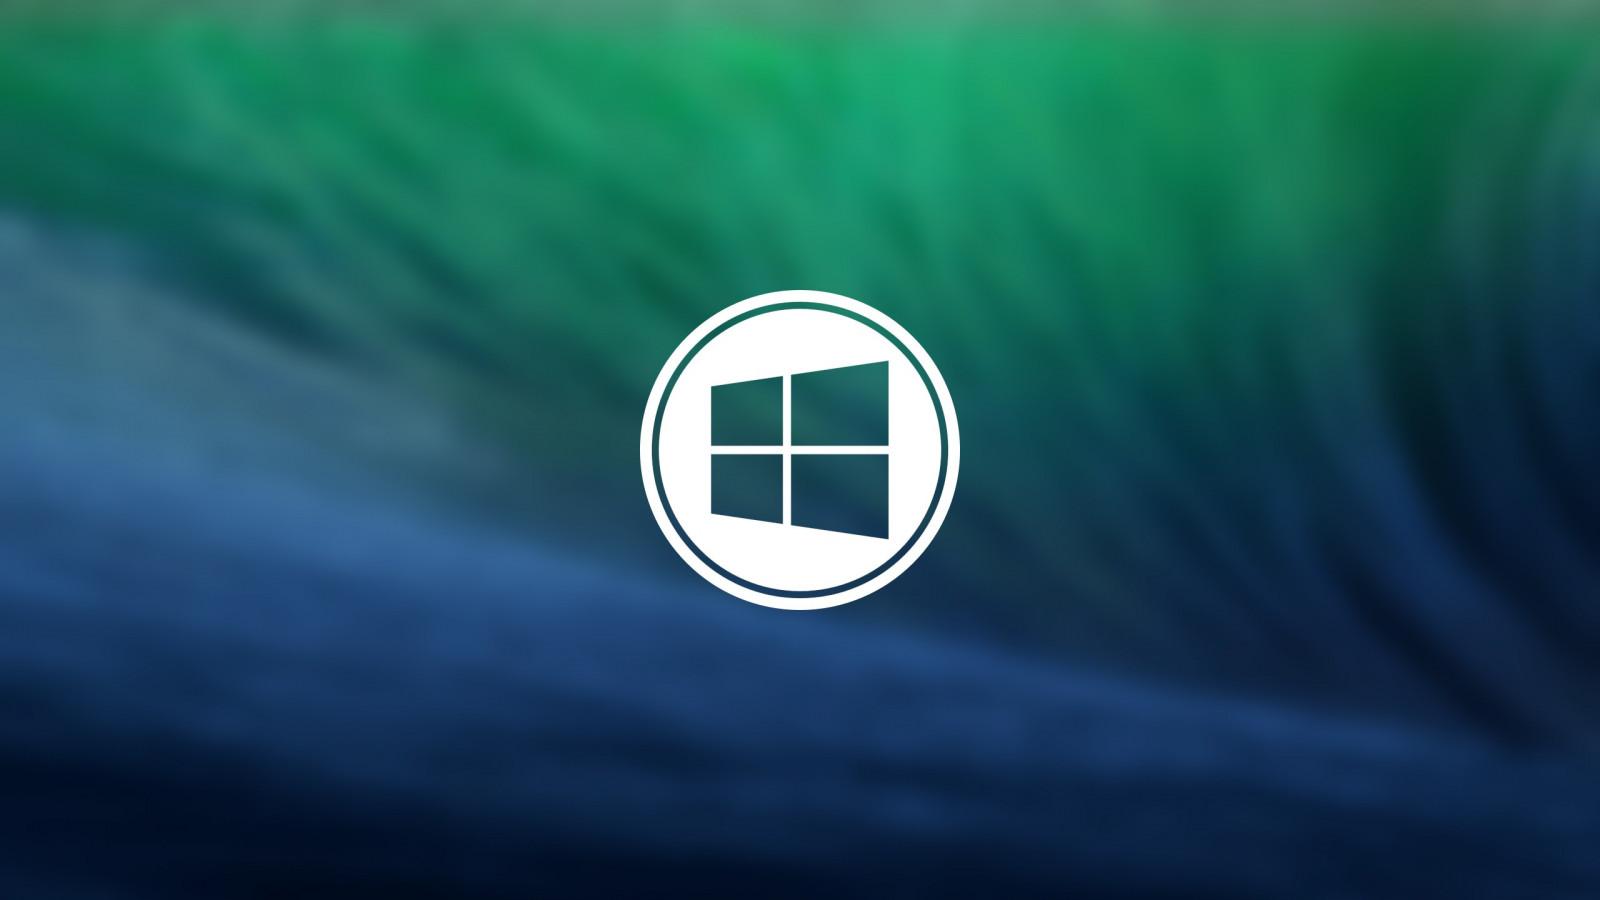 windows 10 earth - photo #7